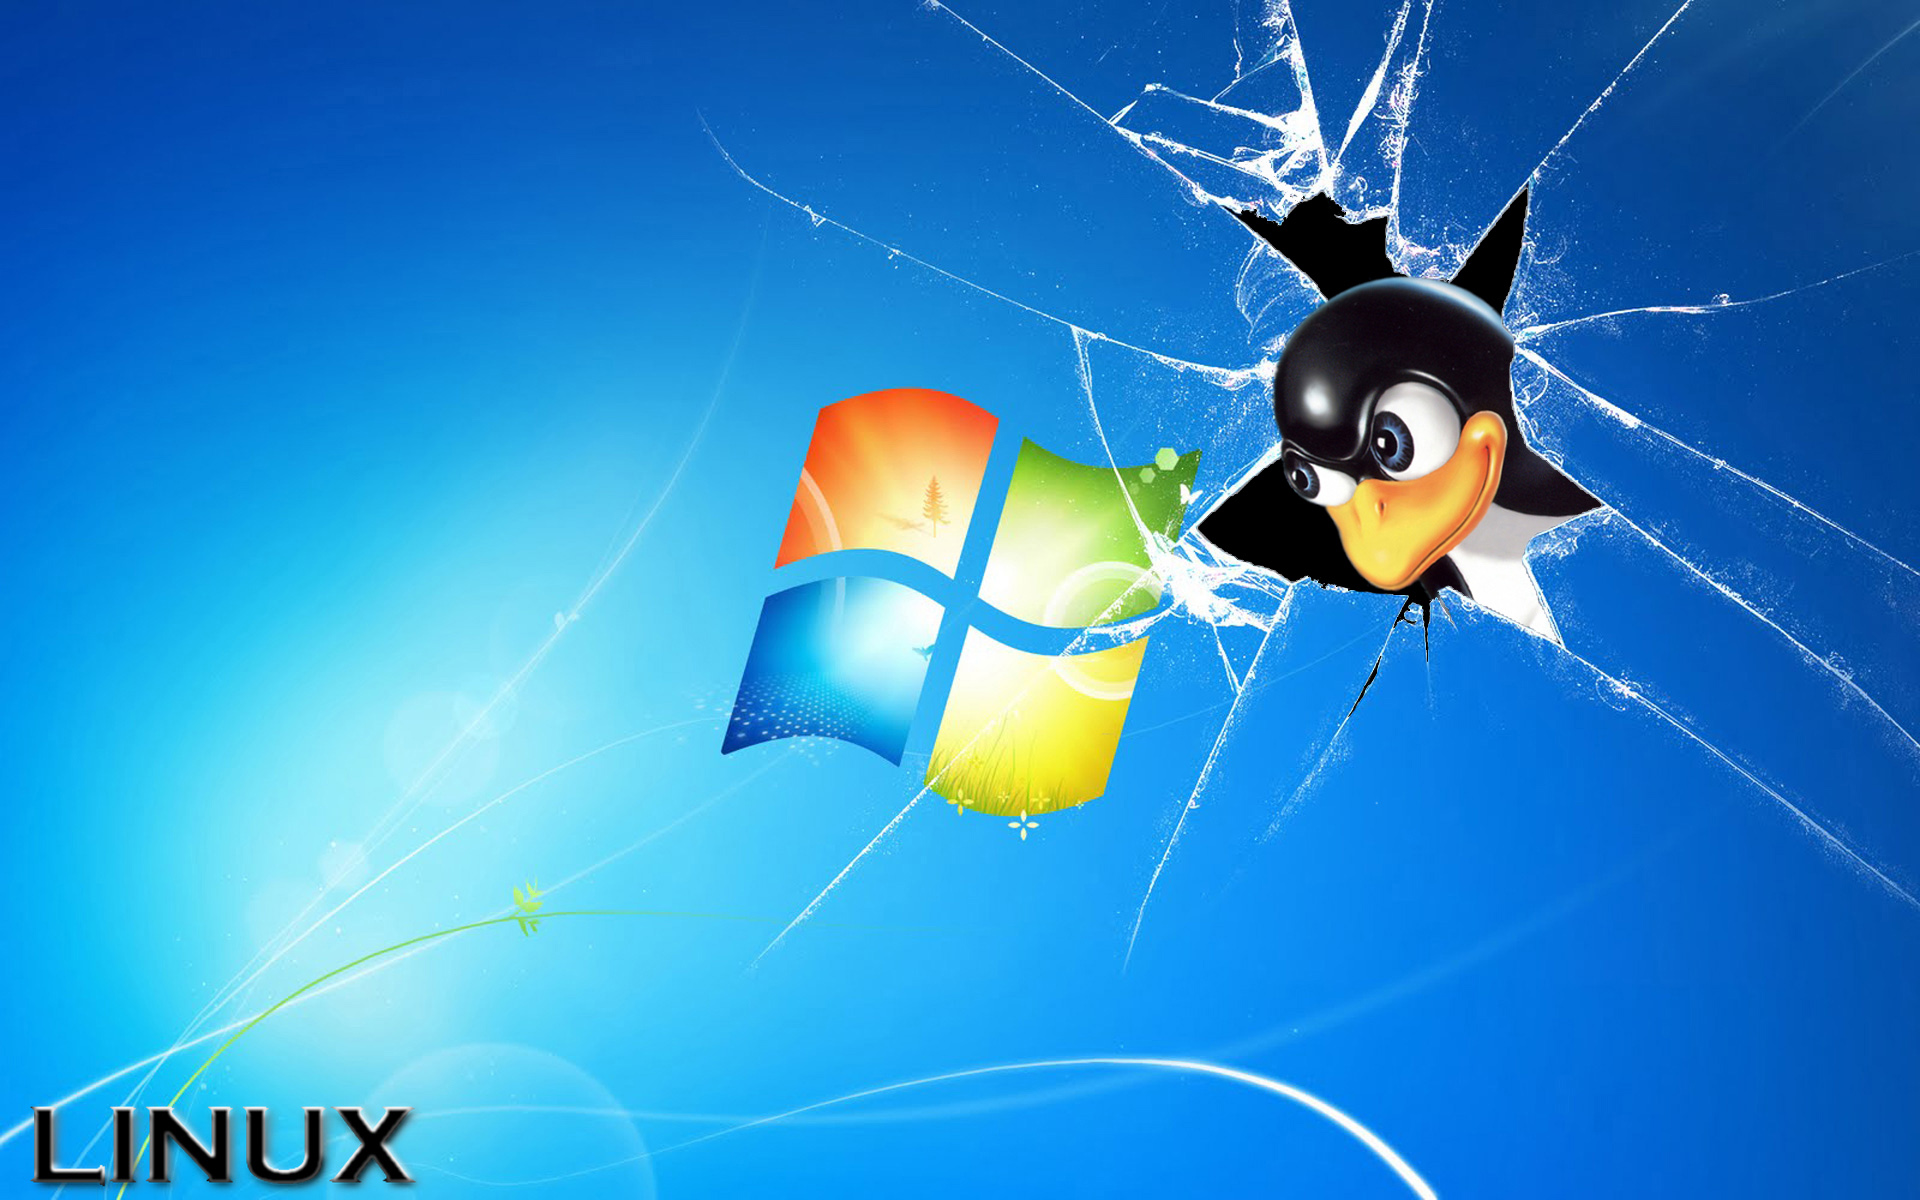 Windows apesta Linux 7 febrero 2011 1920x1200